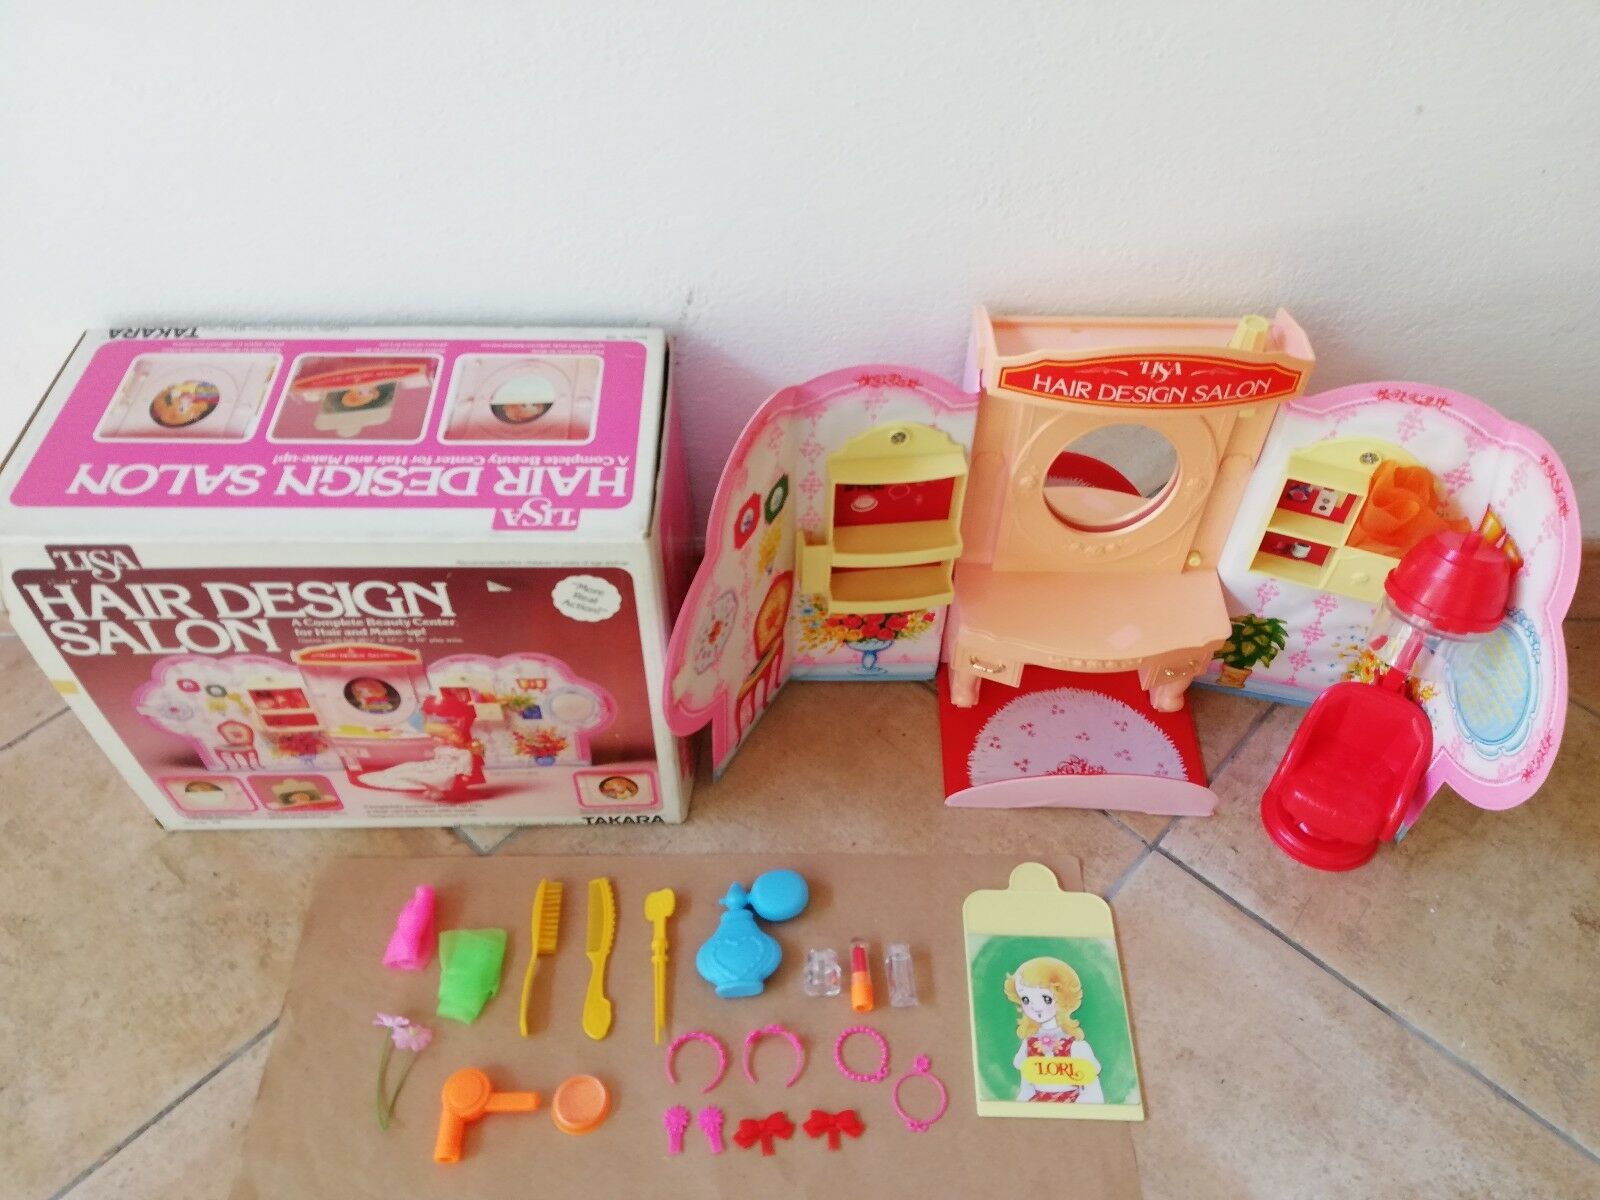 LISA HAIR DESIGN SALON IN BOX VINTAGE TAKARA FASHION DOLLS